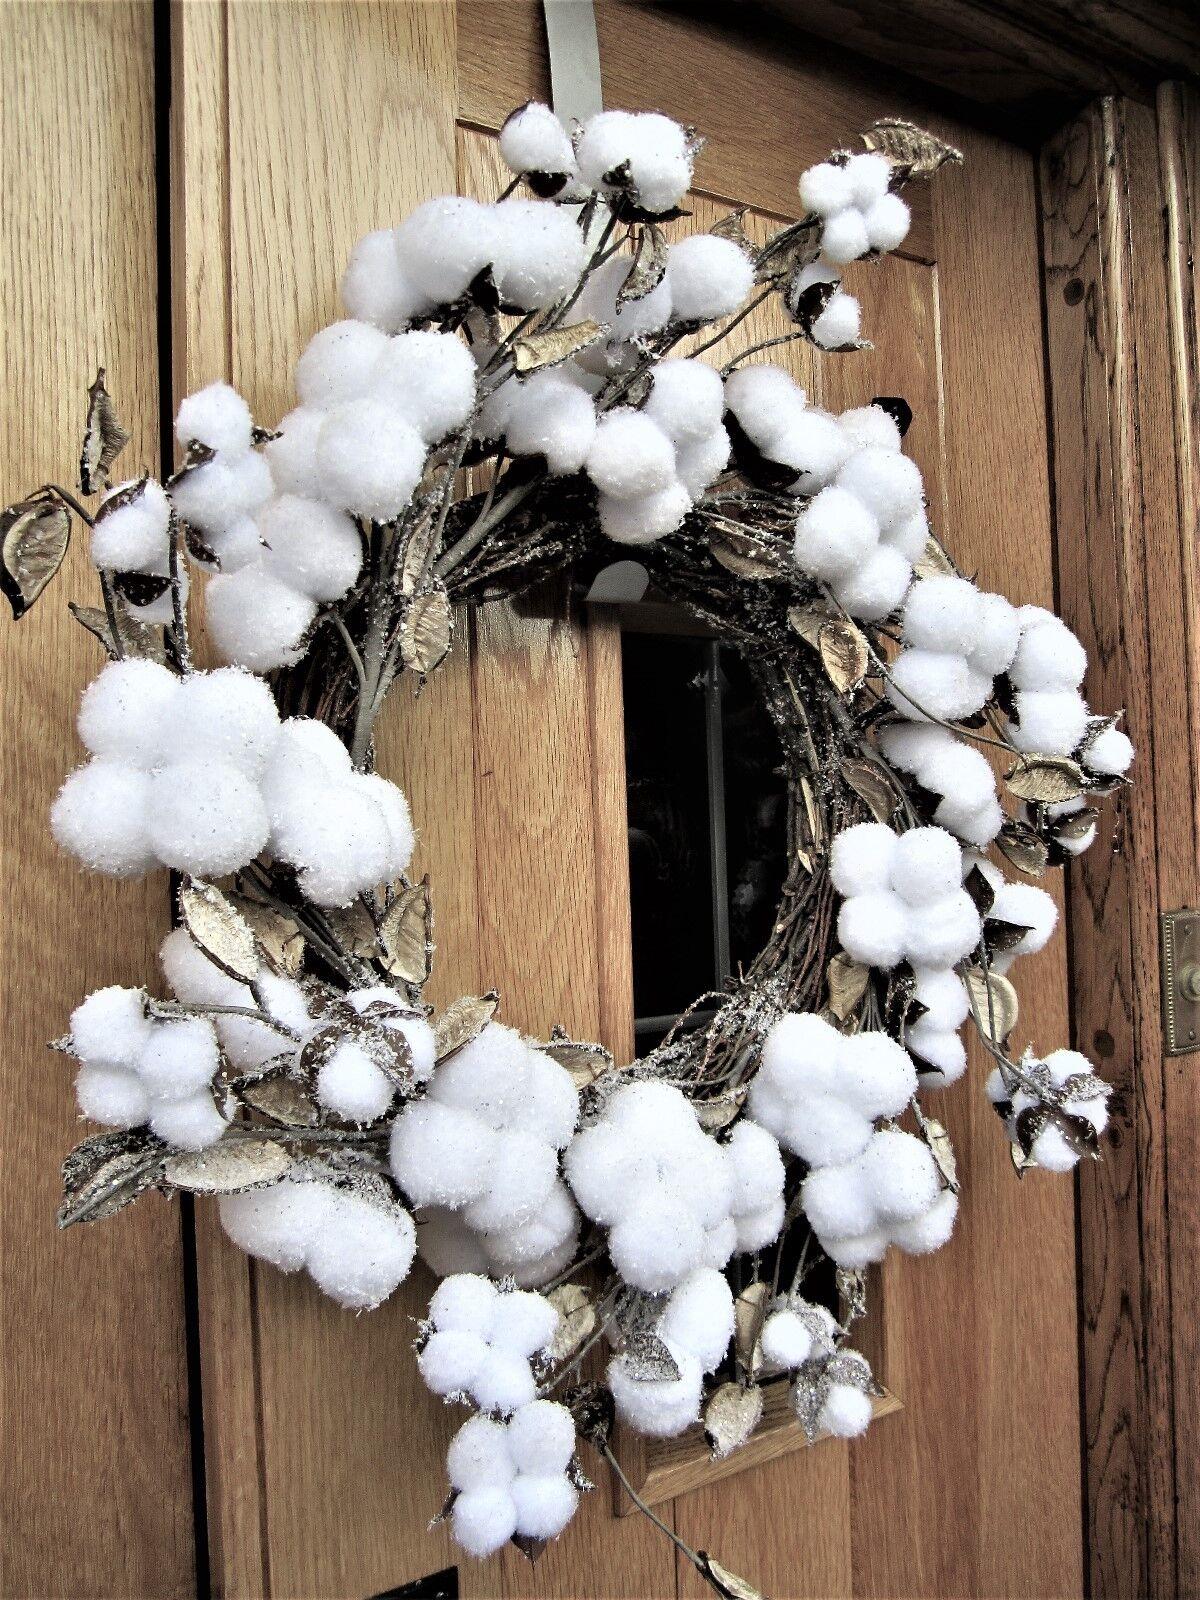 50 cm Cotton Snowball Christmas Winter Wonderland Wreath 6748